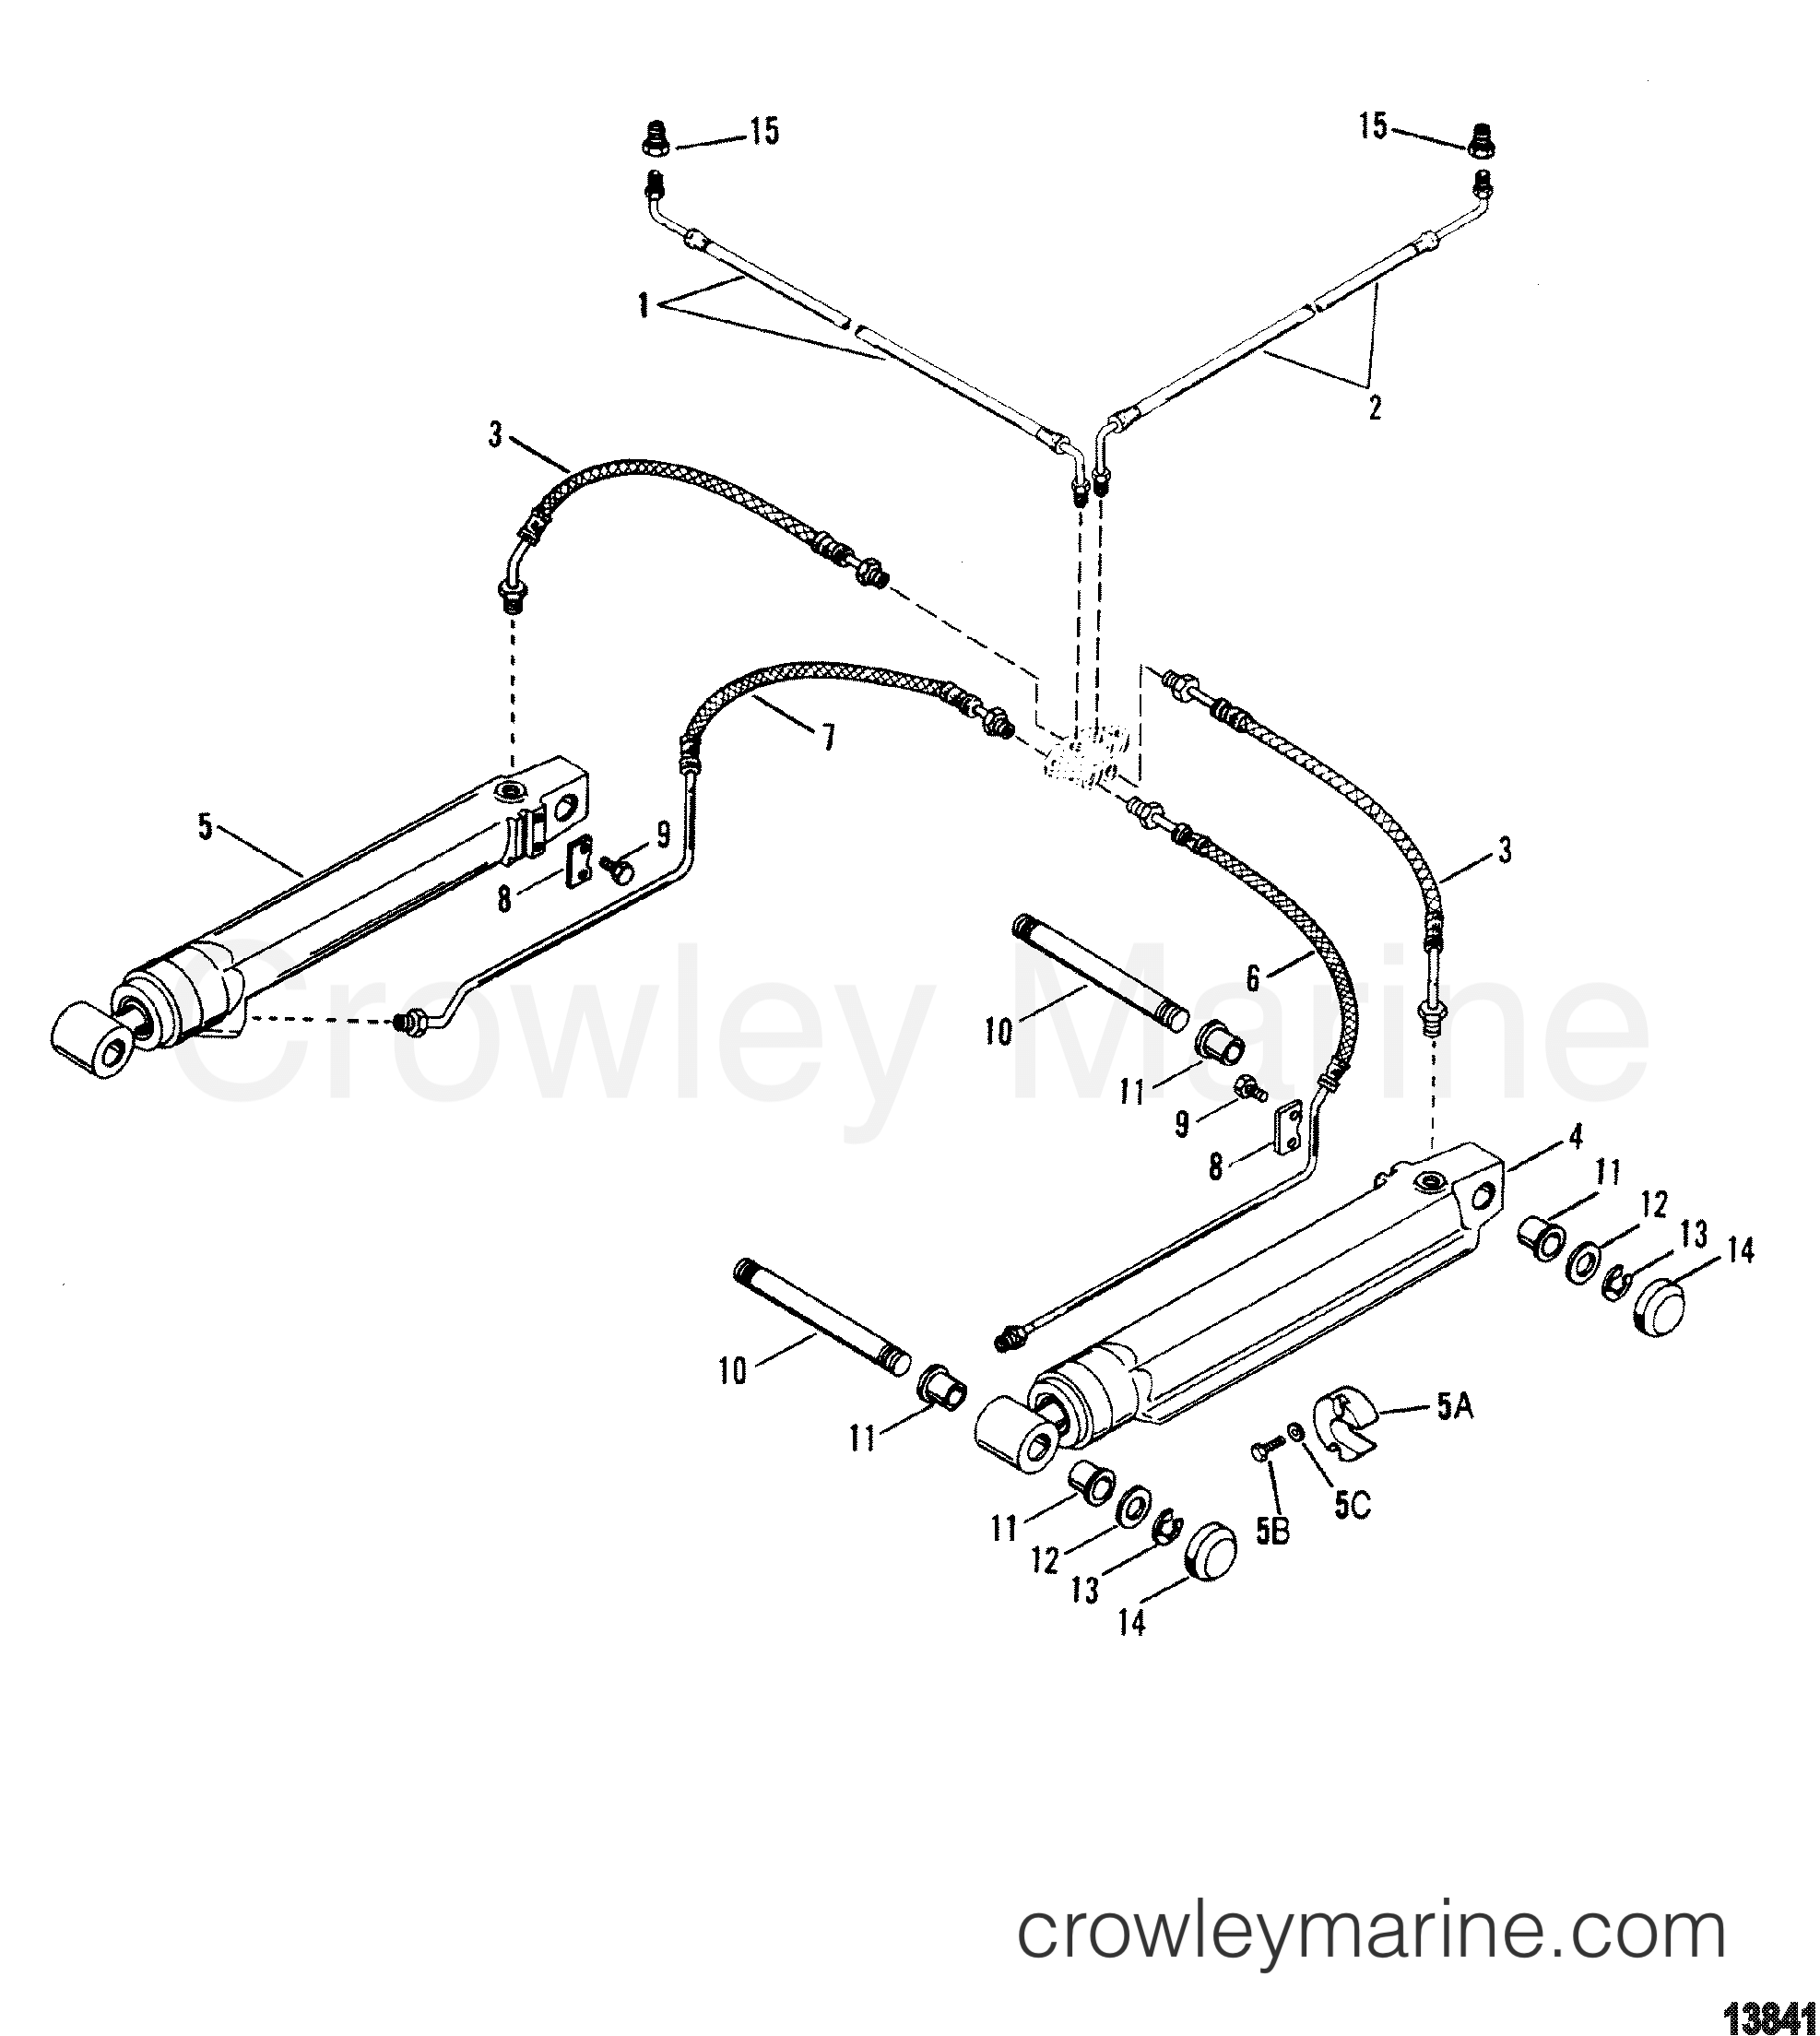 trim cylinders and hydraulic hoses